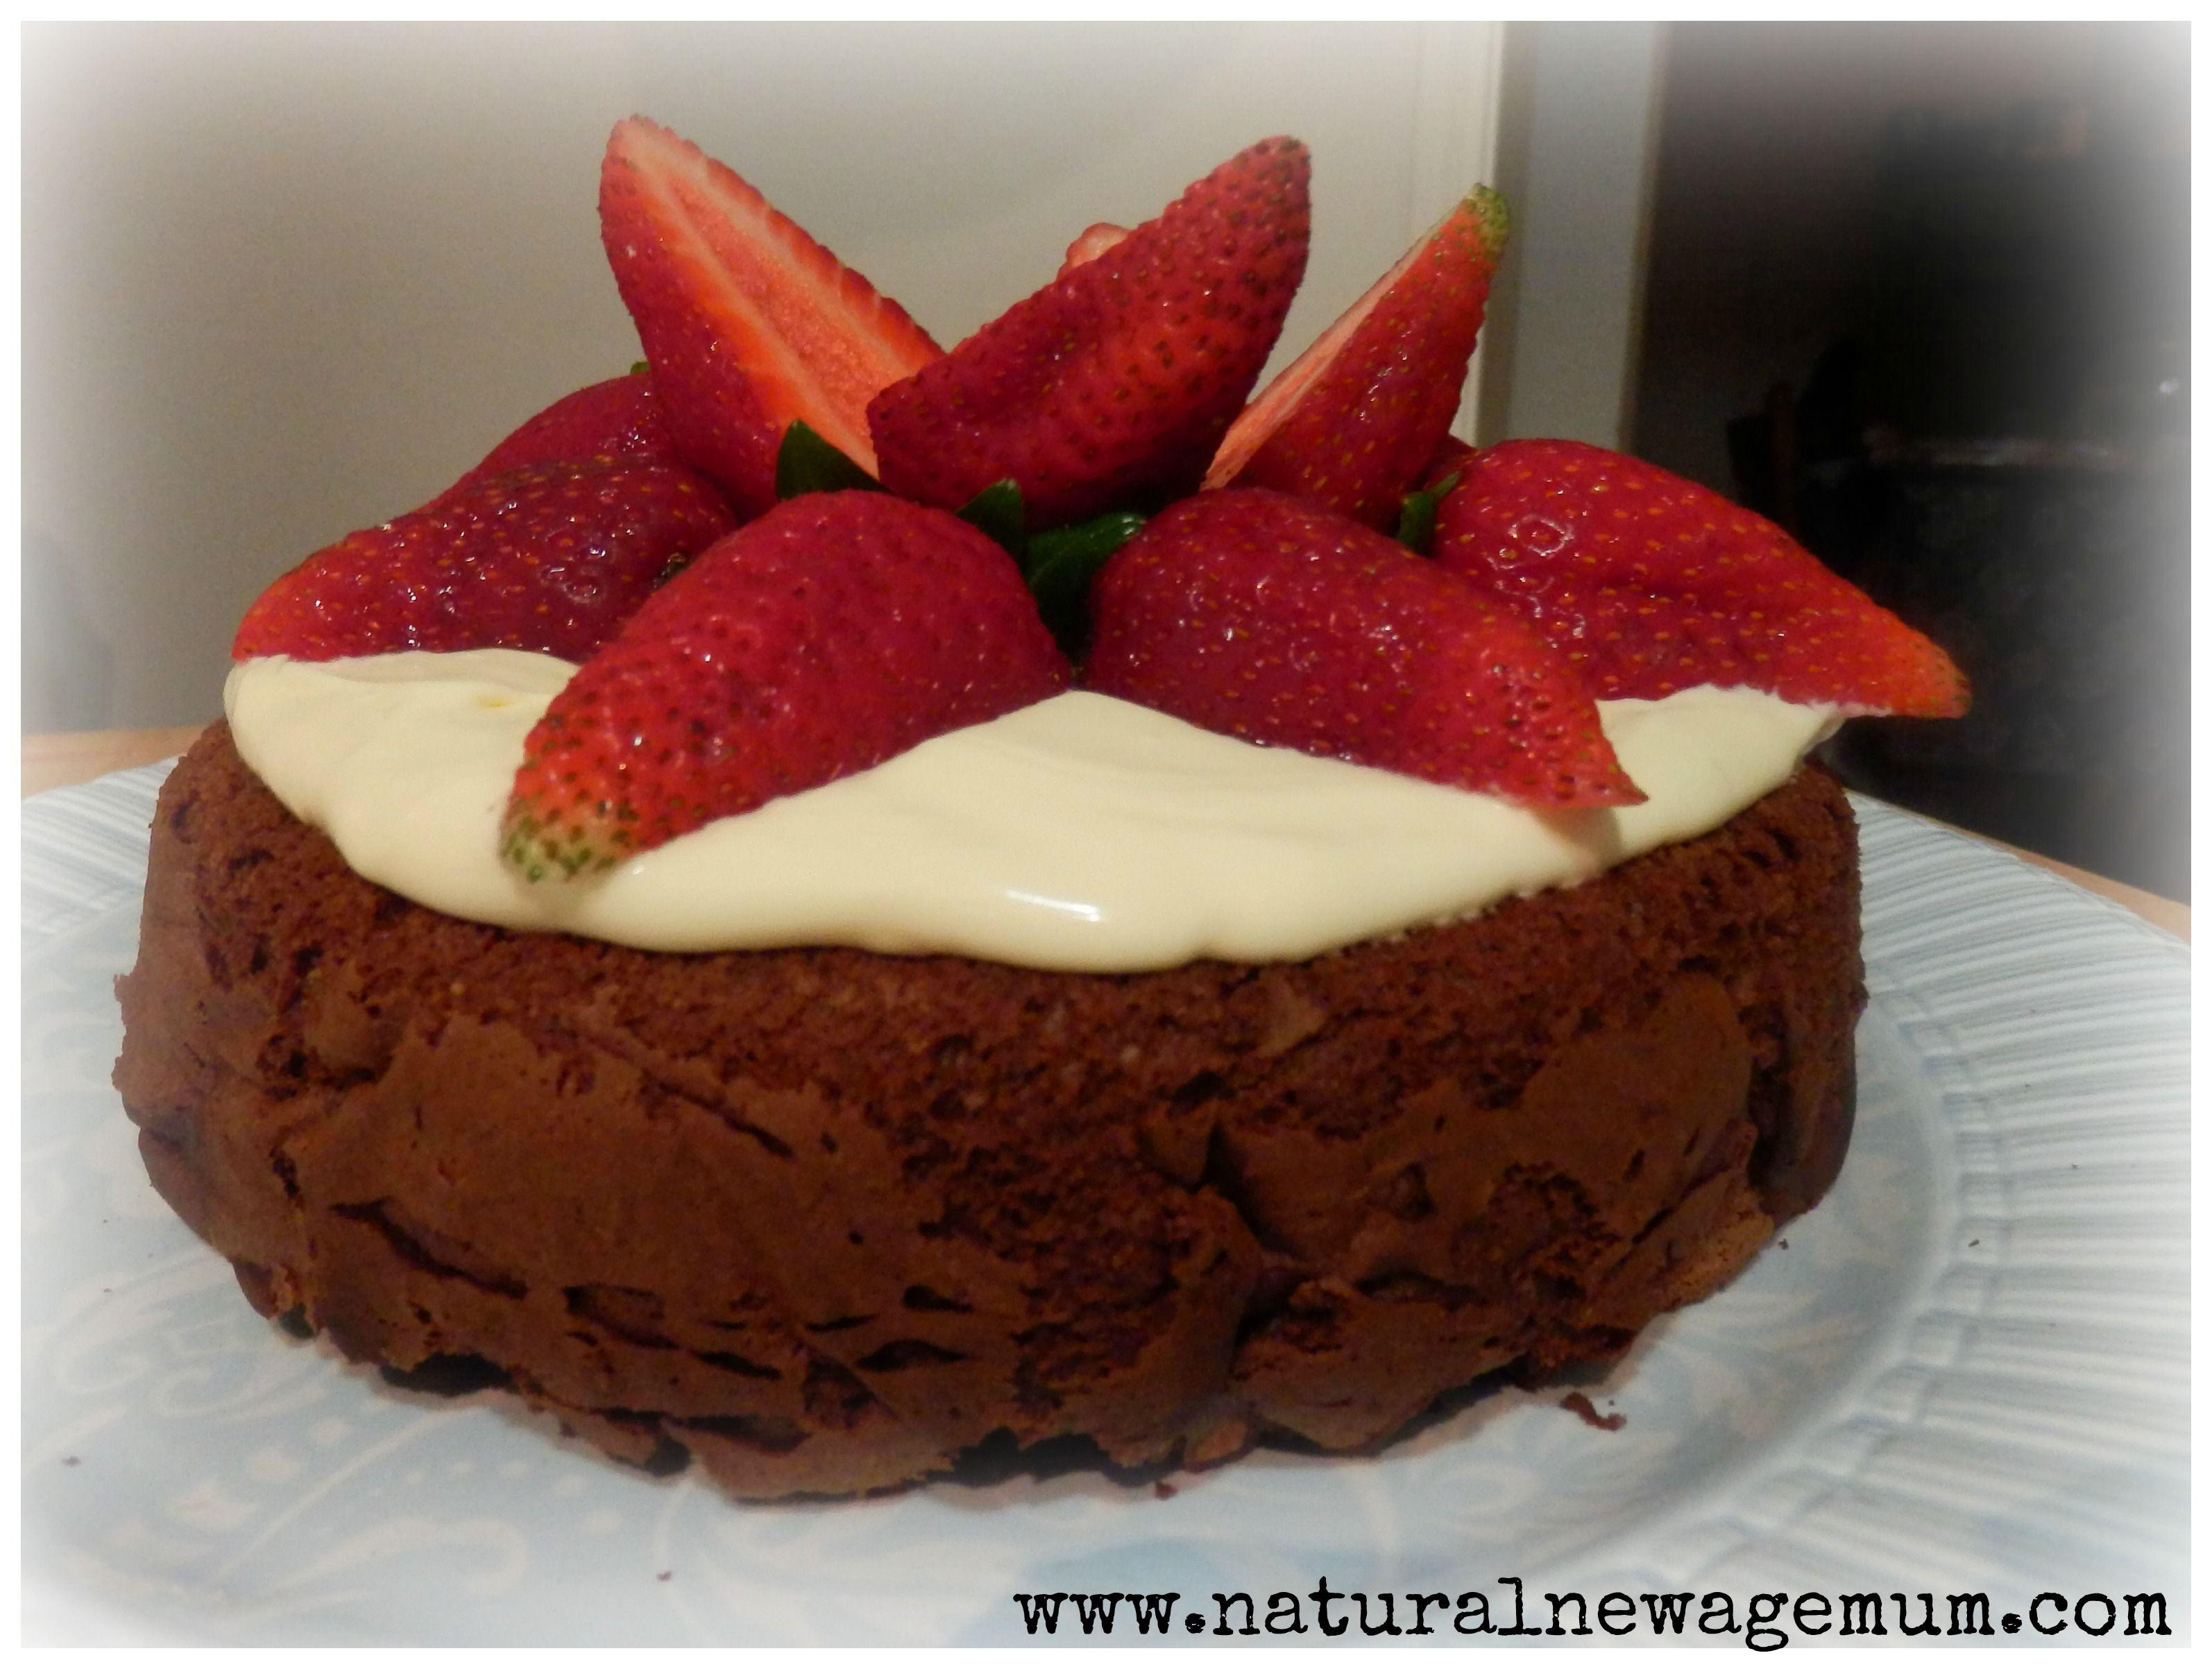 Healthy Birthday Cake Recipes  Six Healthy Birthday Cakes Natural New Age Mum